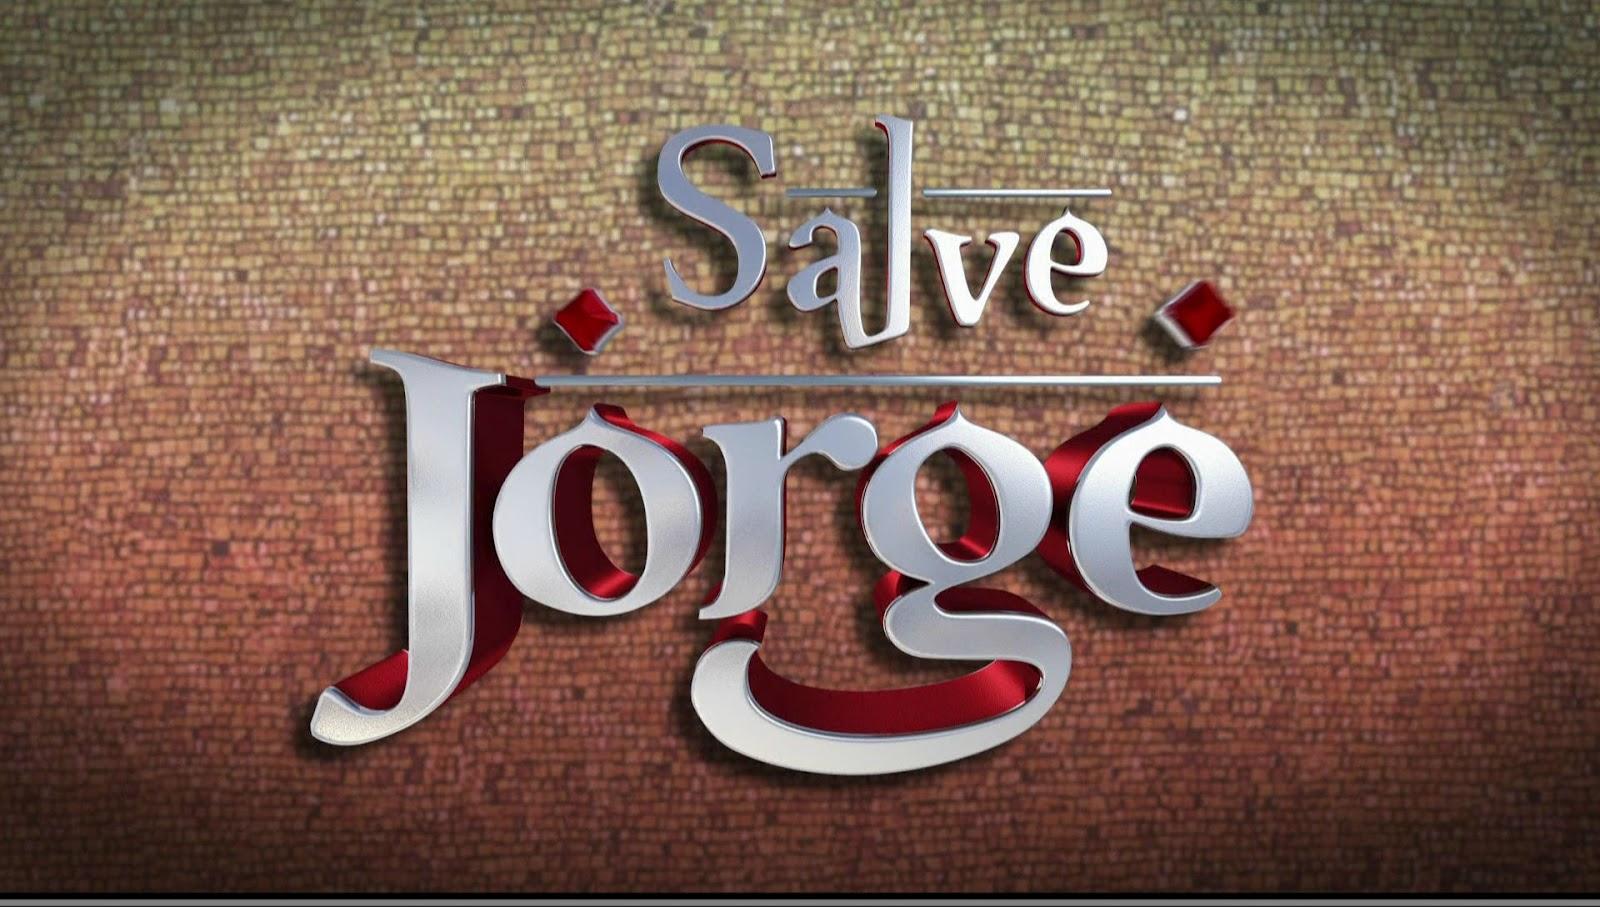 Logo Salve Jorge